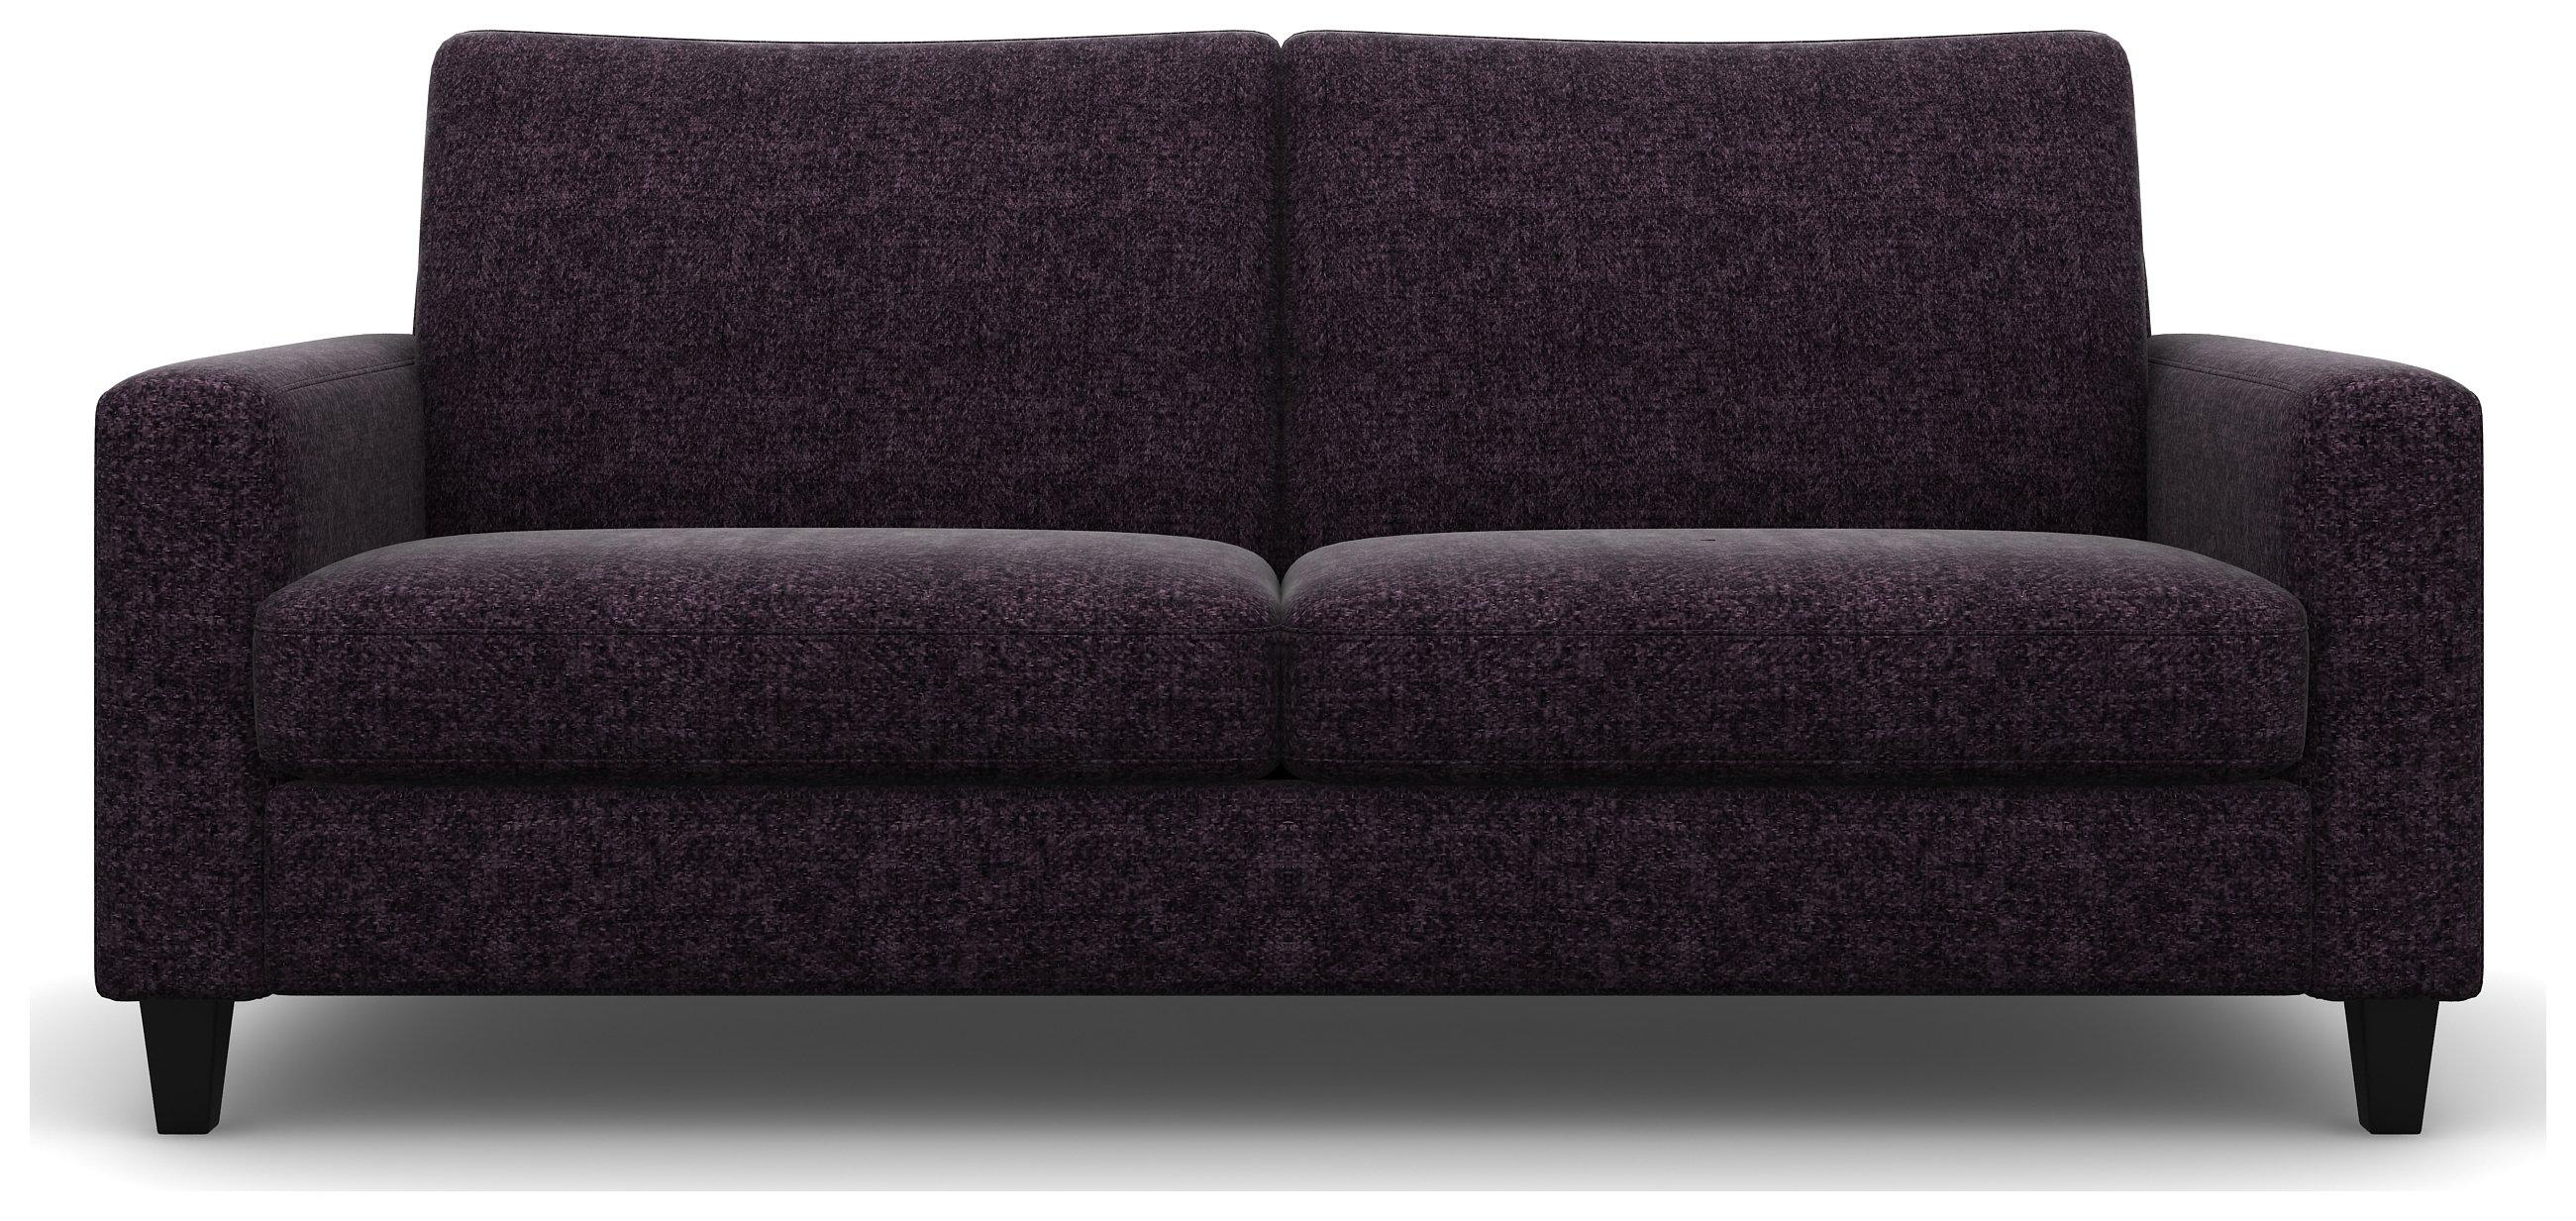 Heart of House Harrison 4 Seater Tweed Fabric Sofa - Purple.